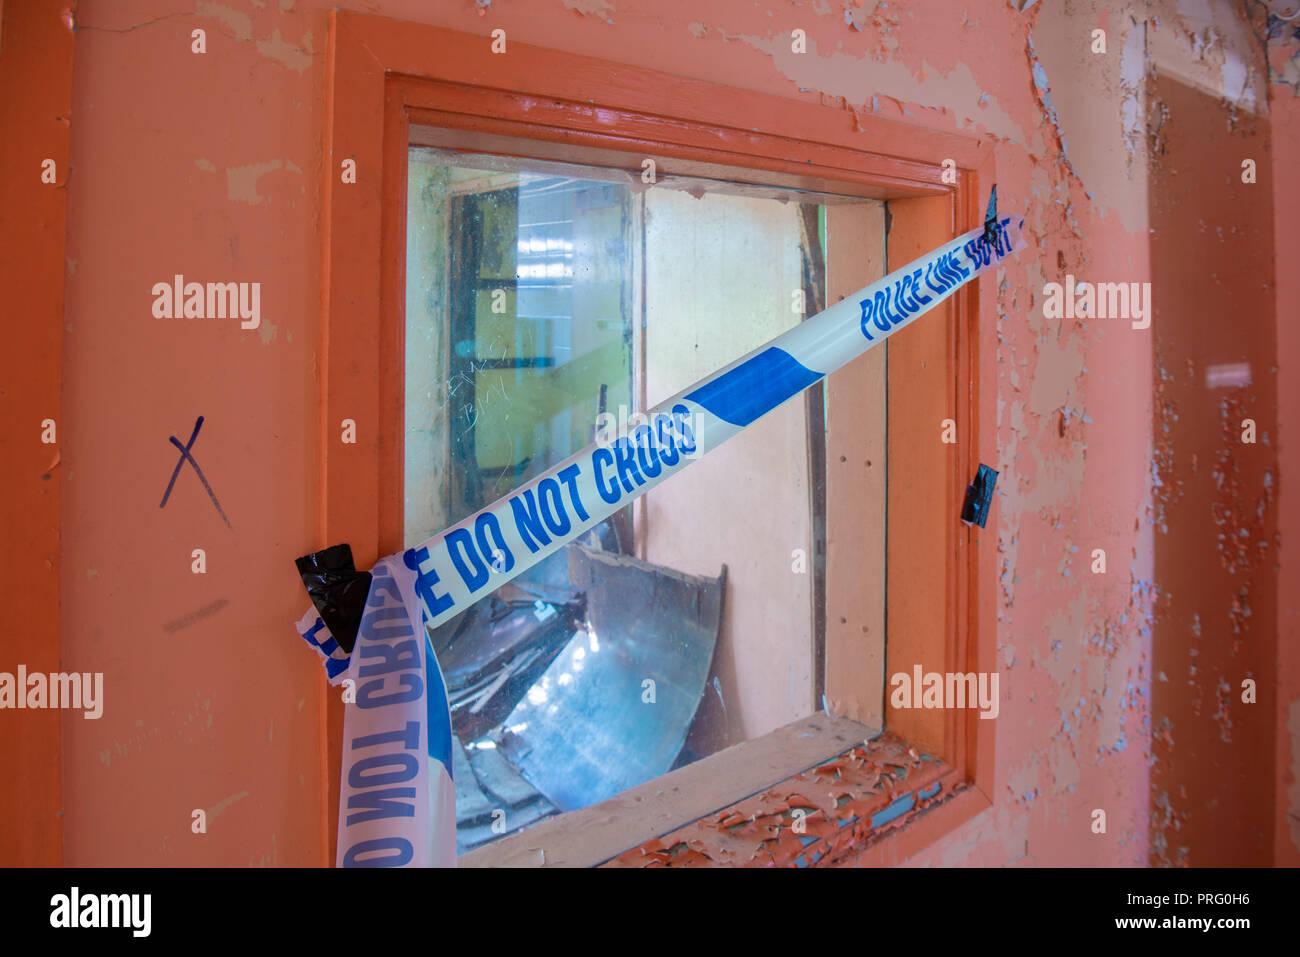 Police cordon tape across a window - Stock Image